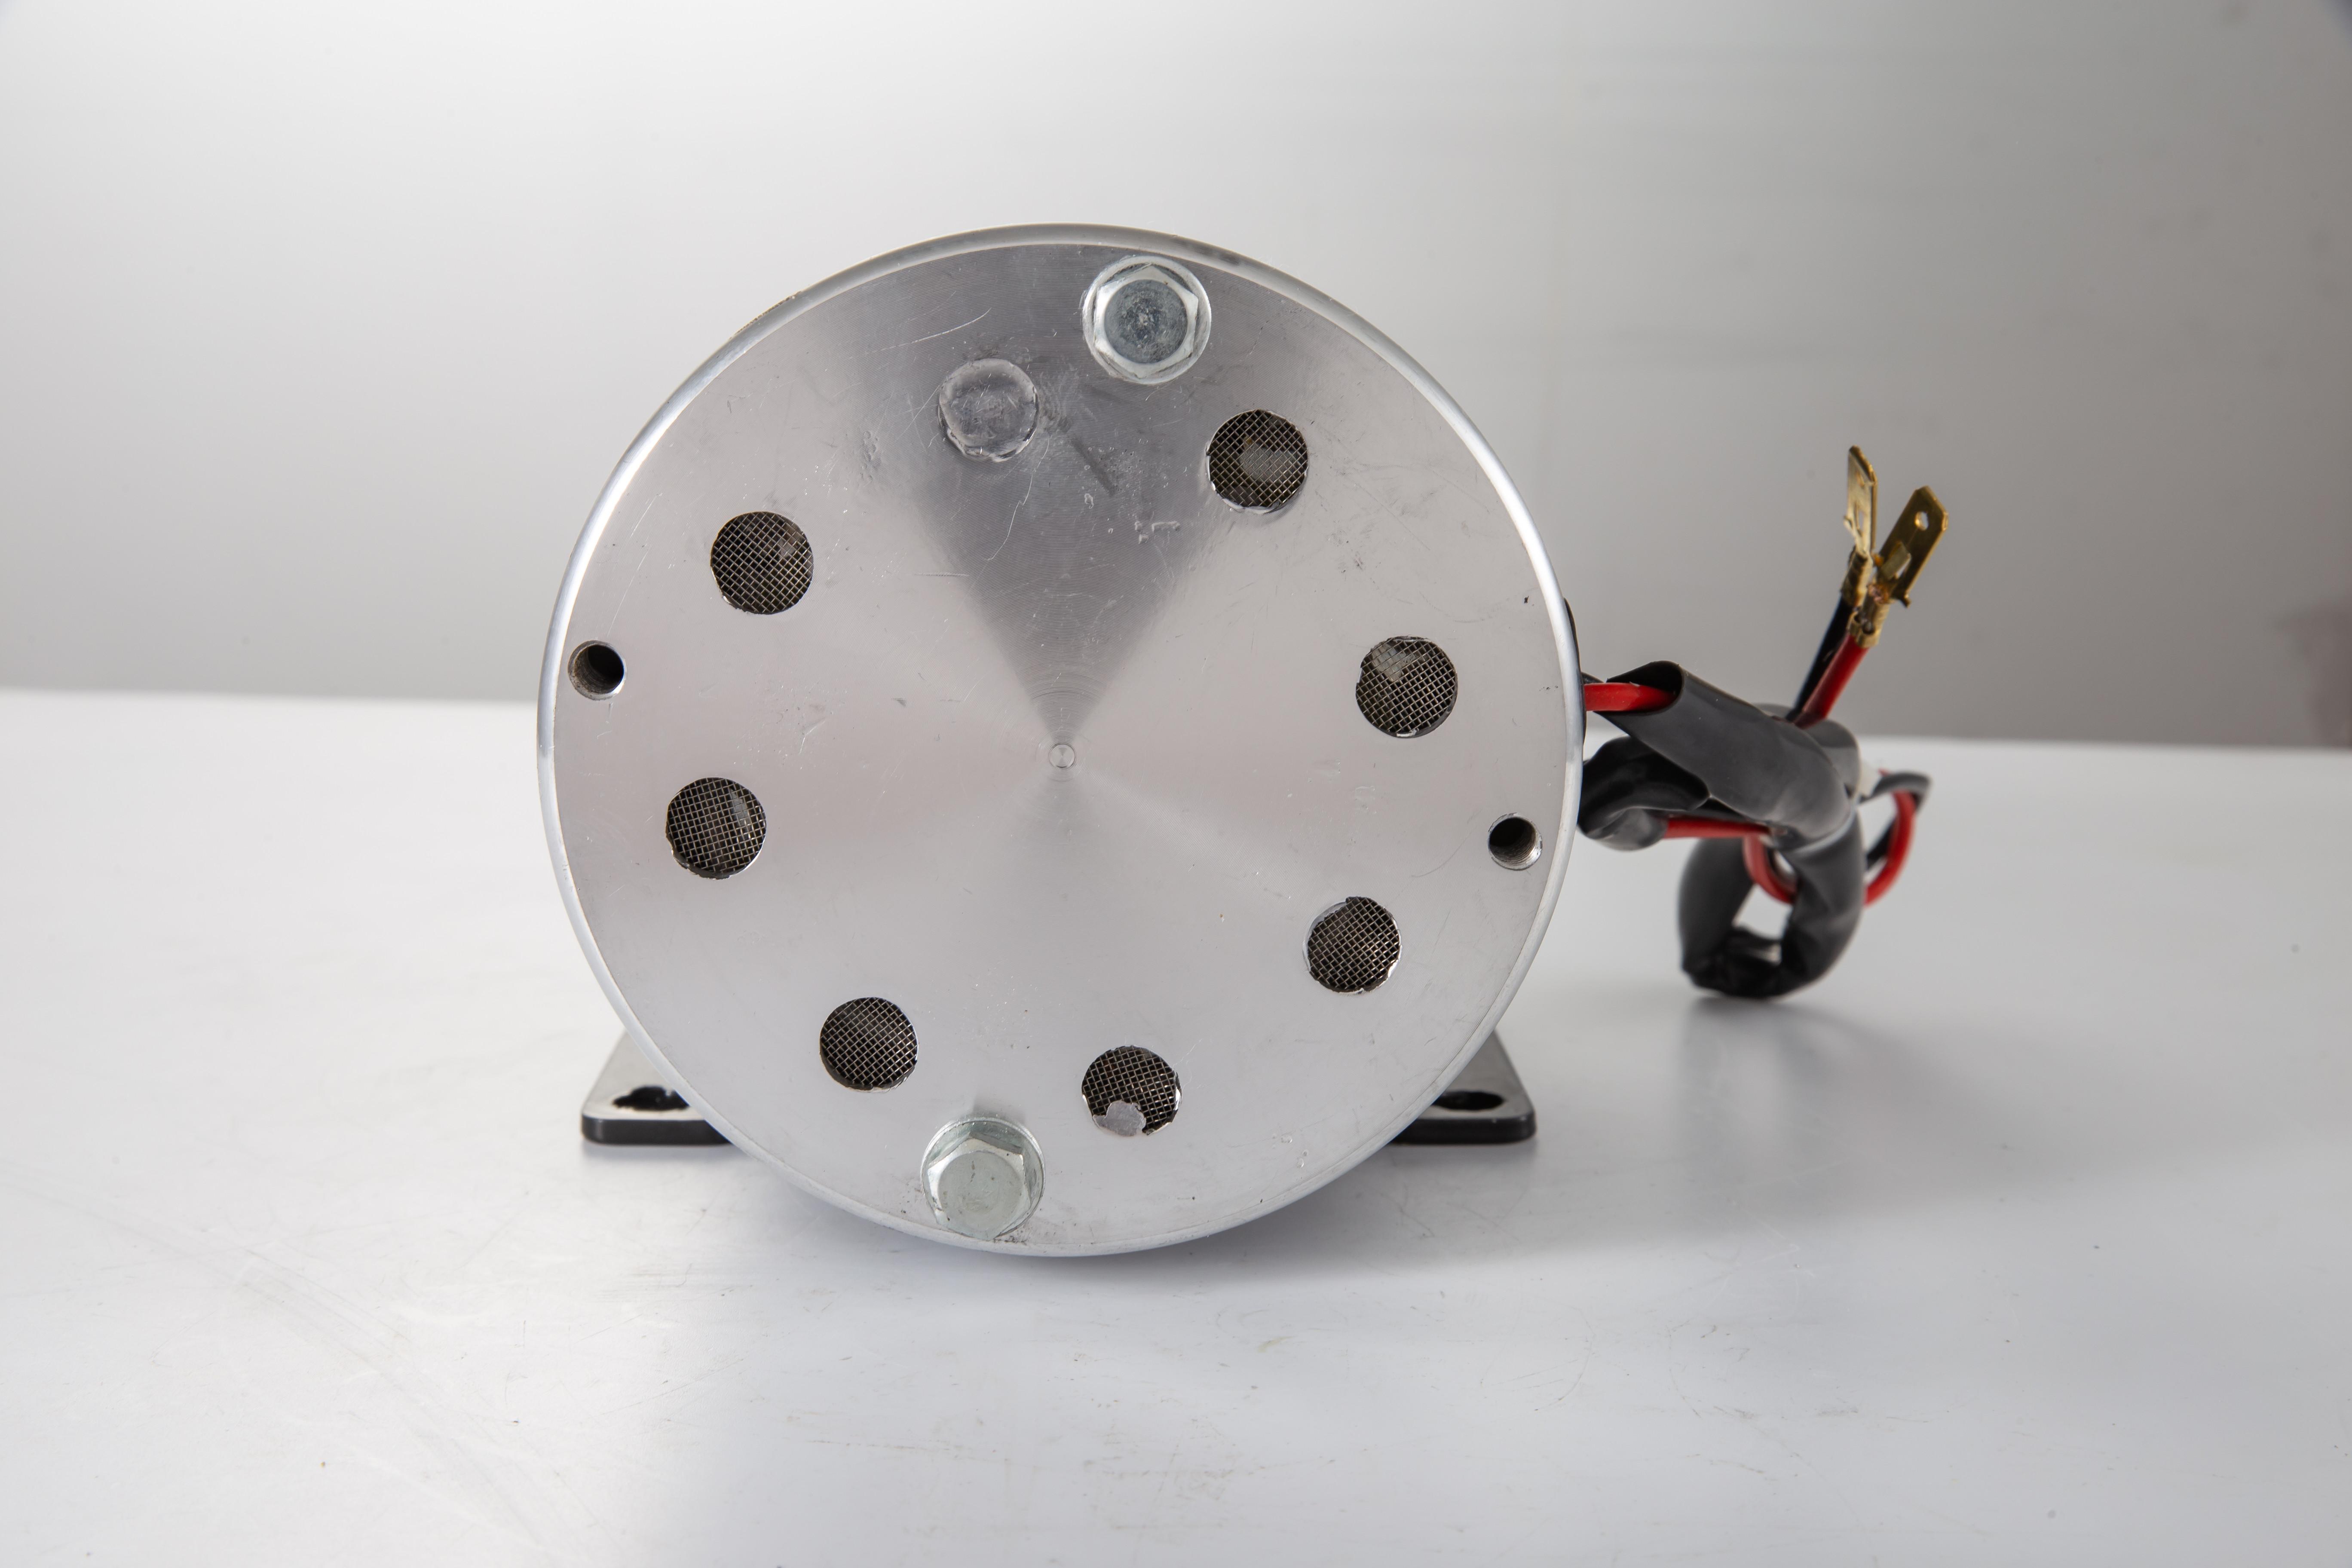 1800W-48V-DC-Brushless-Electric-Motor-Kit-f-Scooter-500-1800W-E-Bike-Go-Kart thumbnail 91